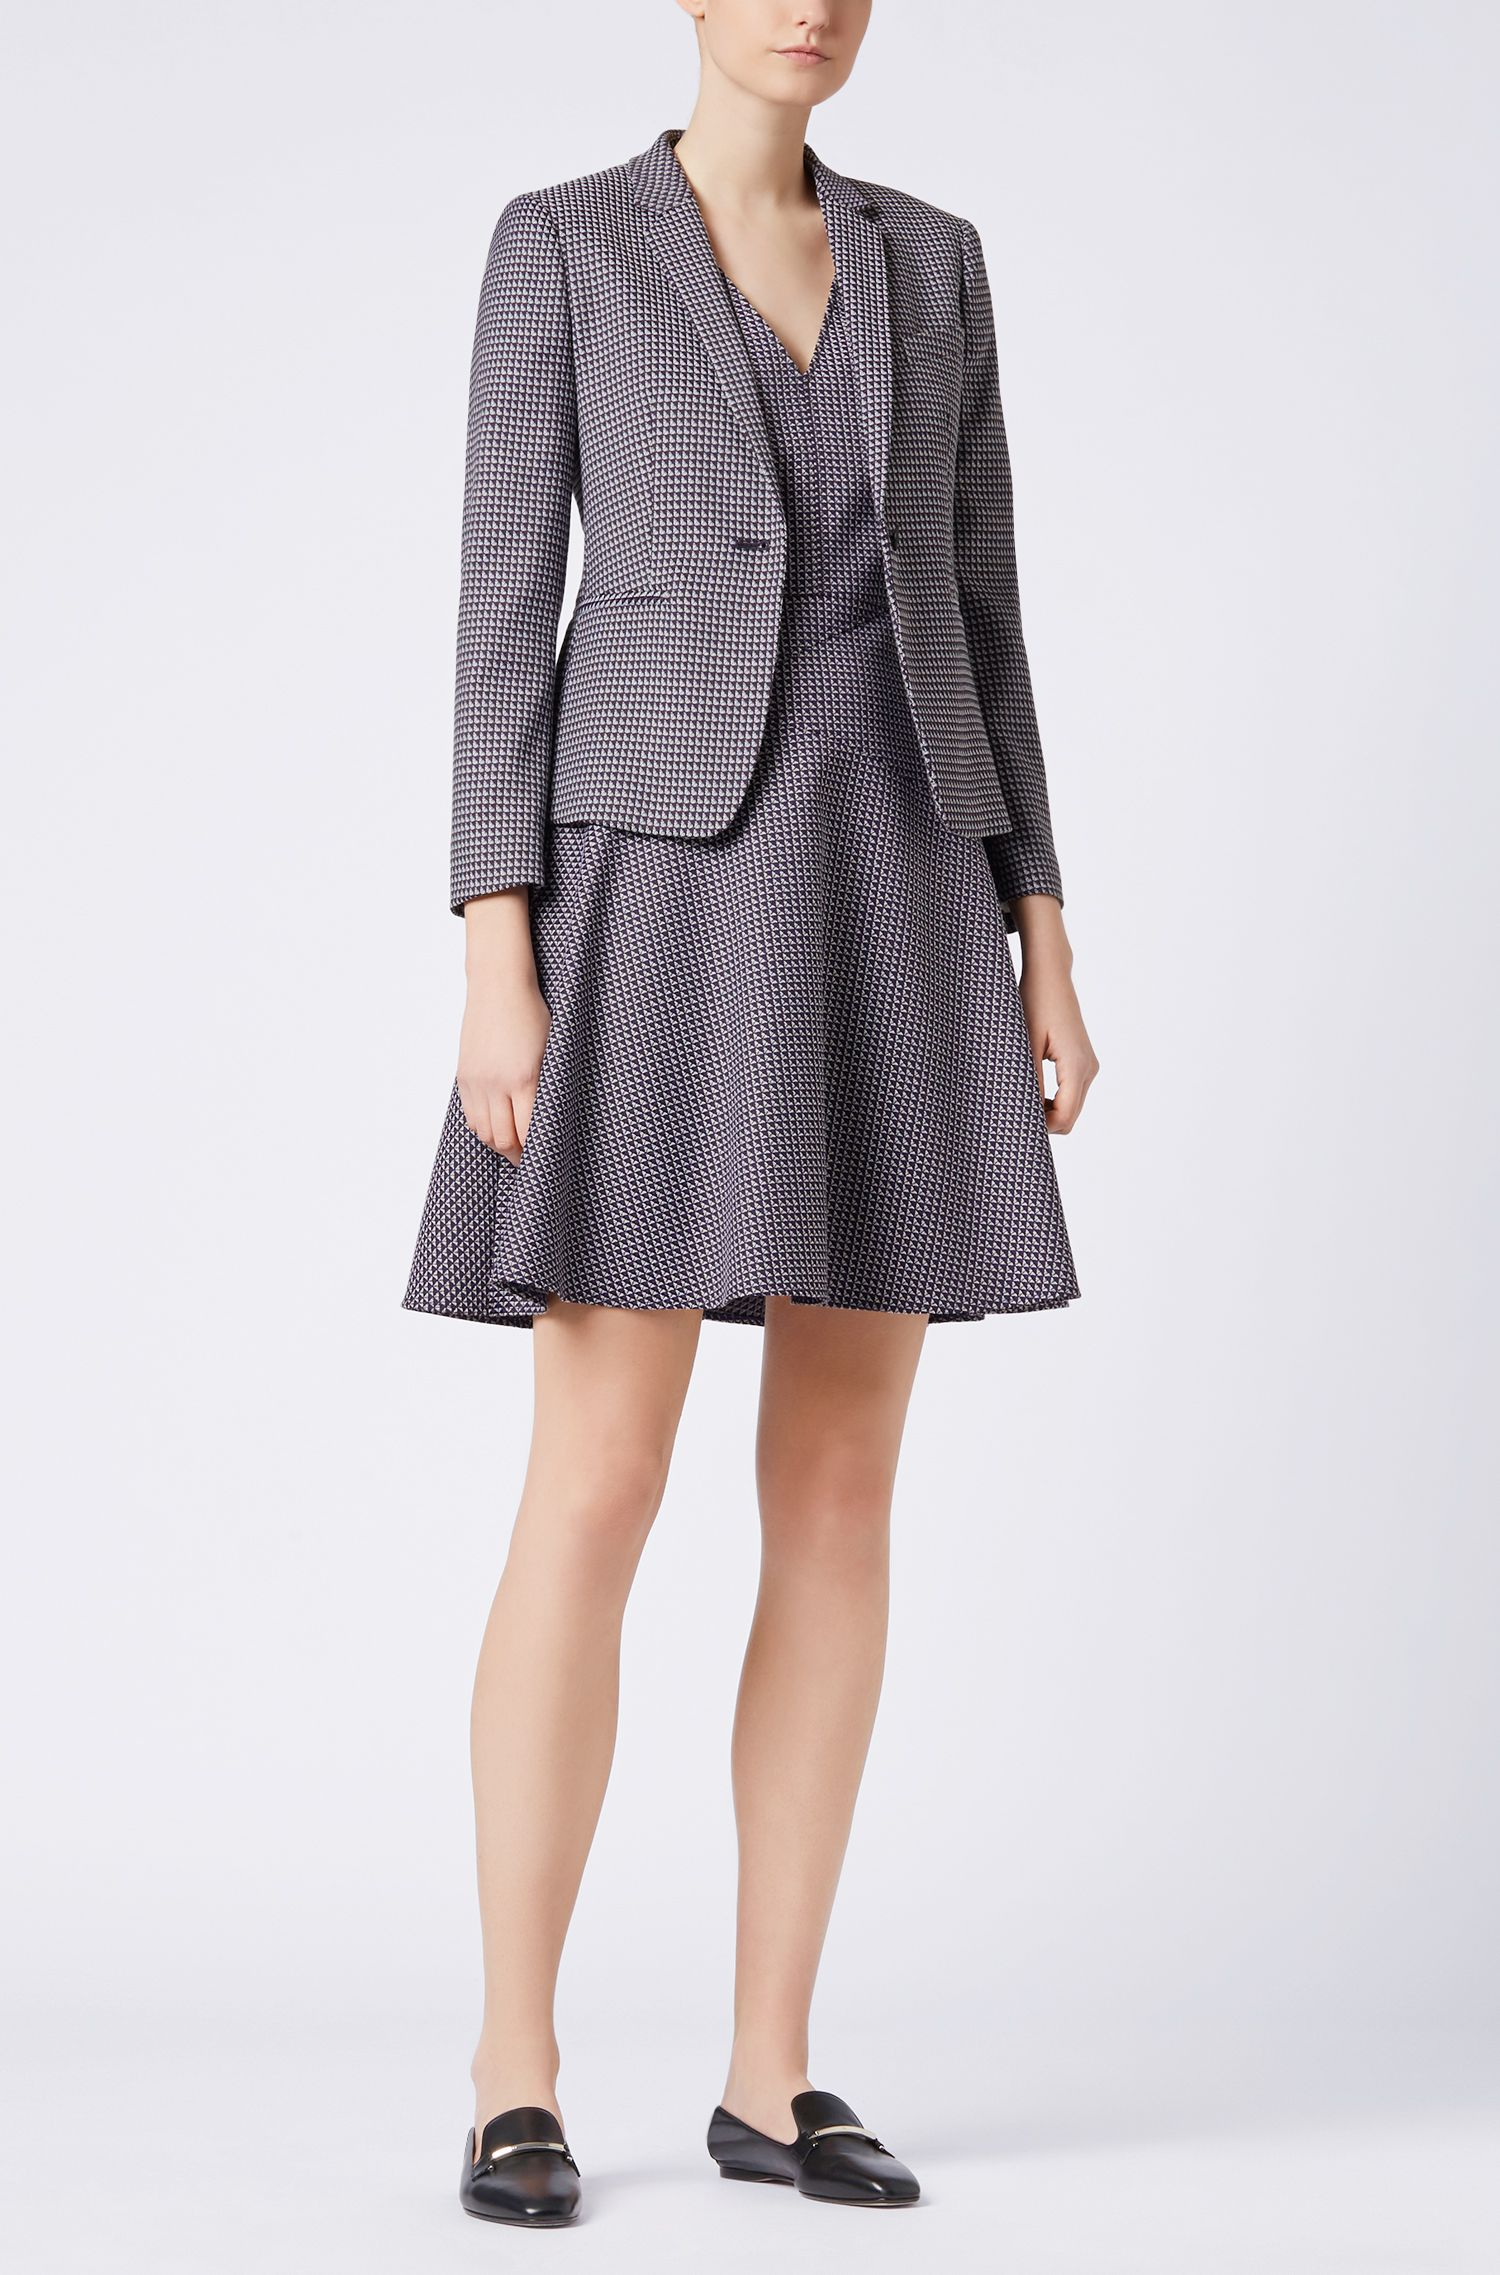 Regular-fit blazer in stretch cotton-blend jacquard, Patterned